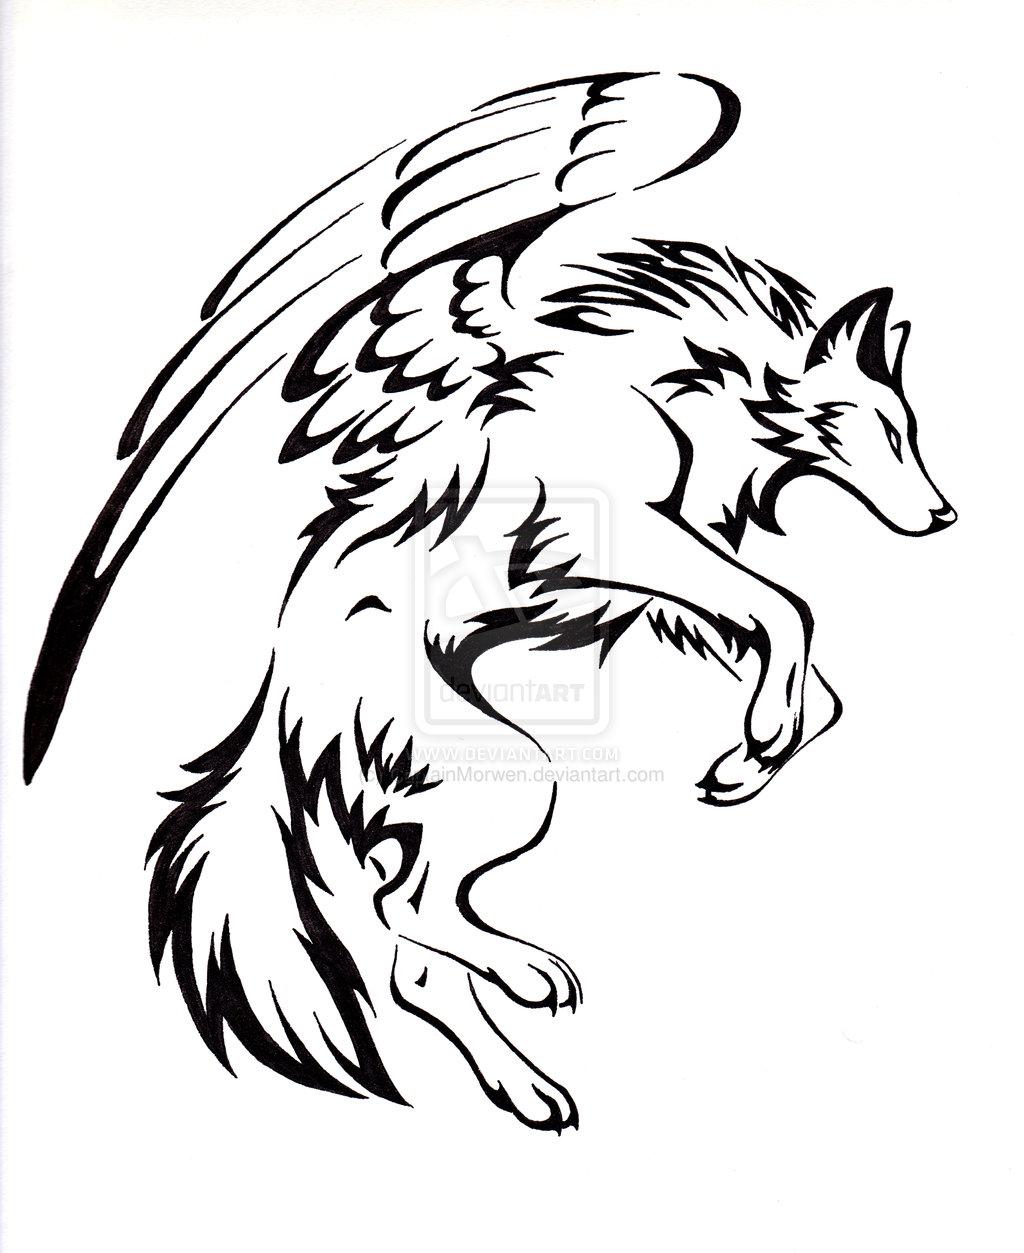 Wolf Tattoo Drawing Free Download Best Wolf Tattoo Drawing